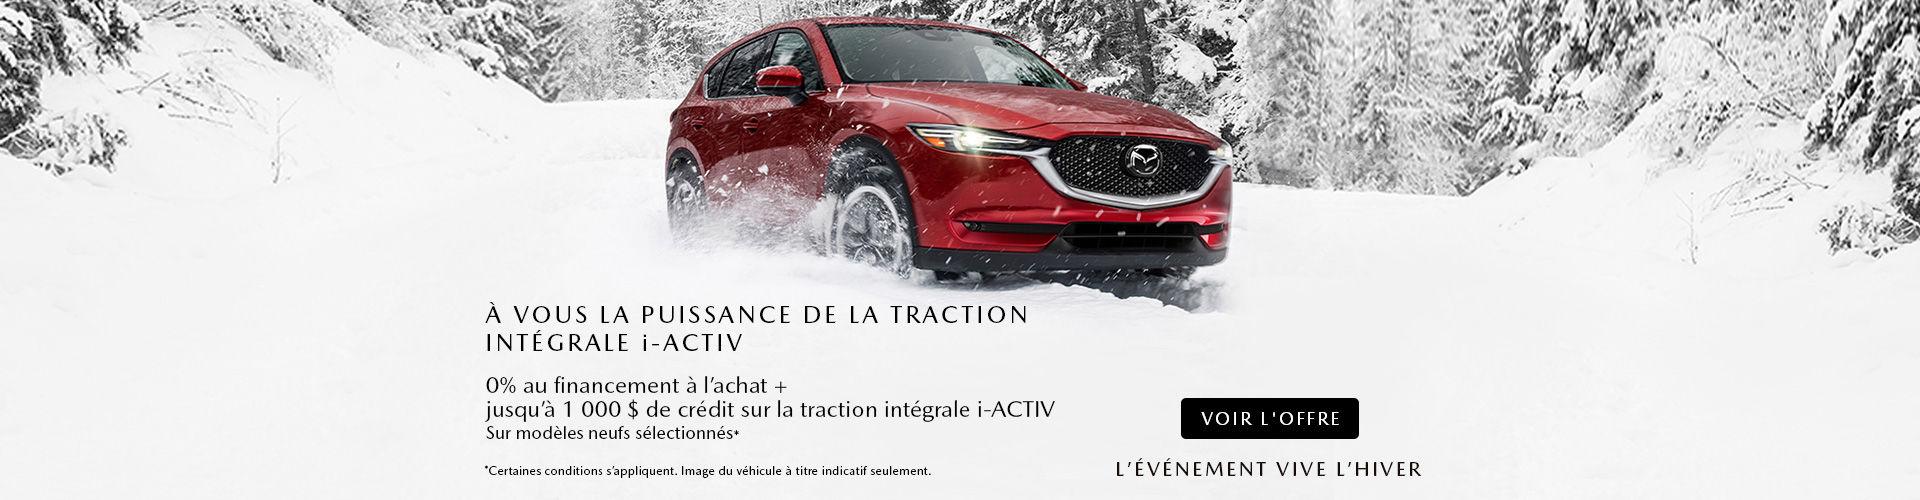 Mazda événement